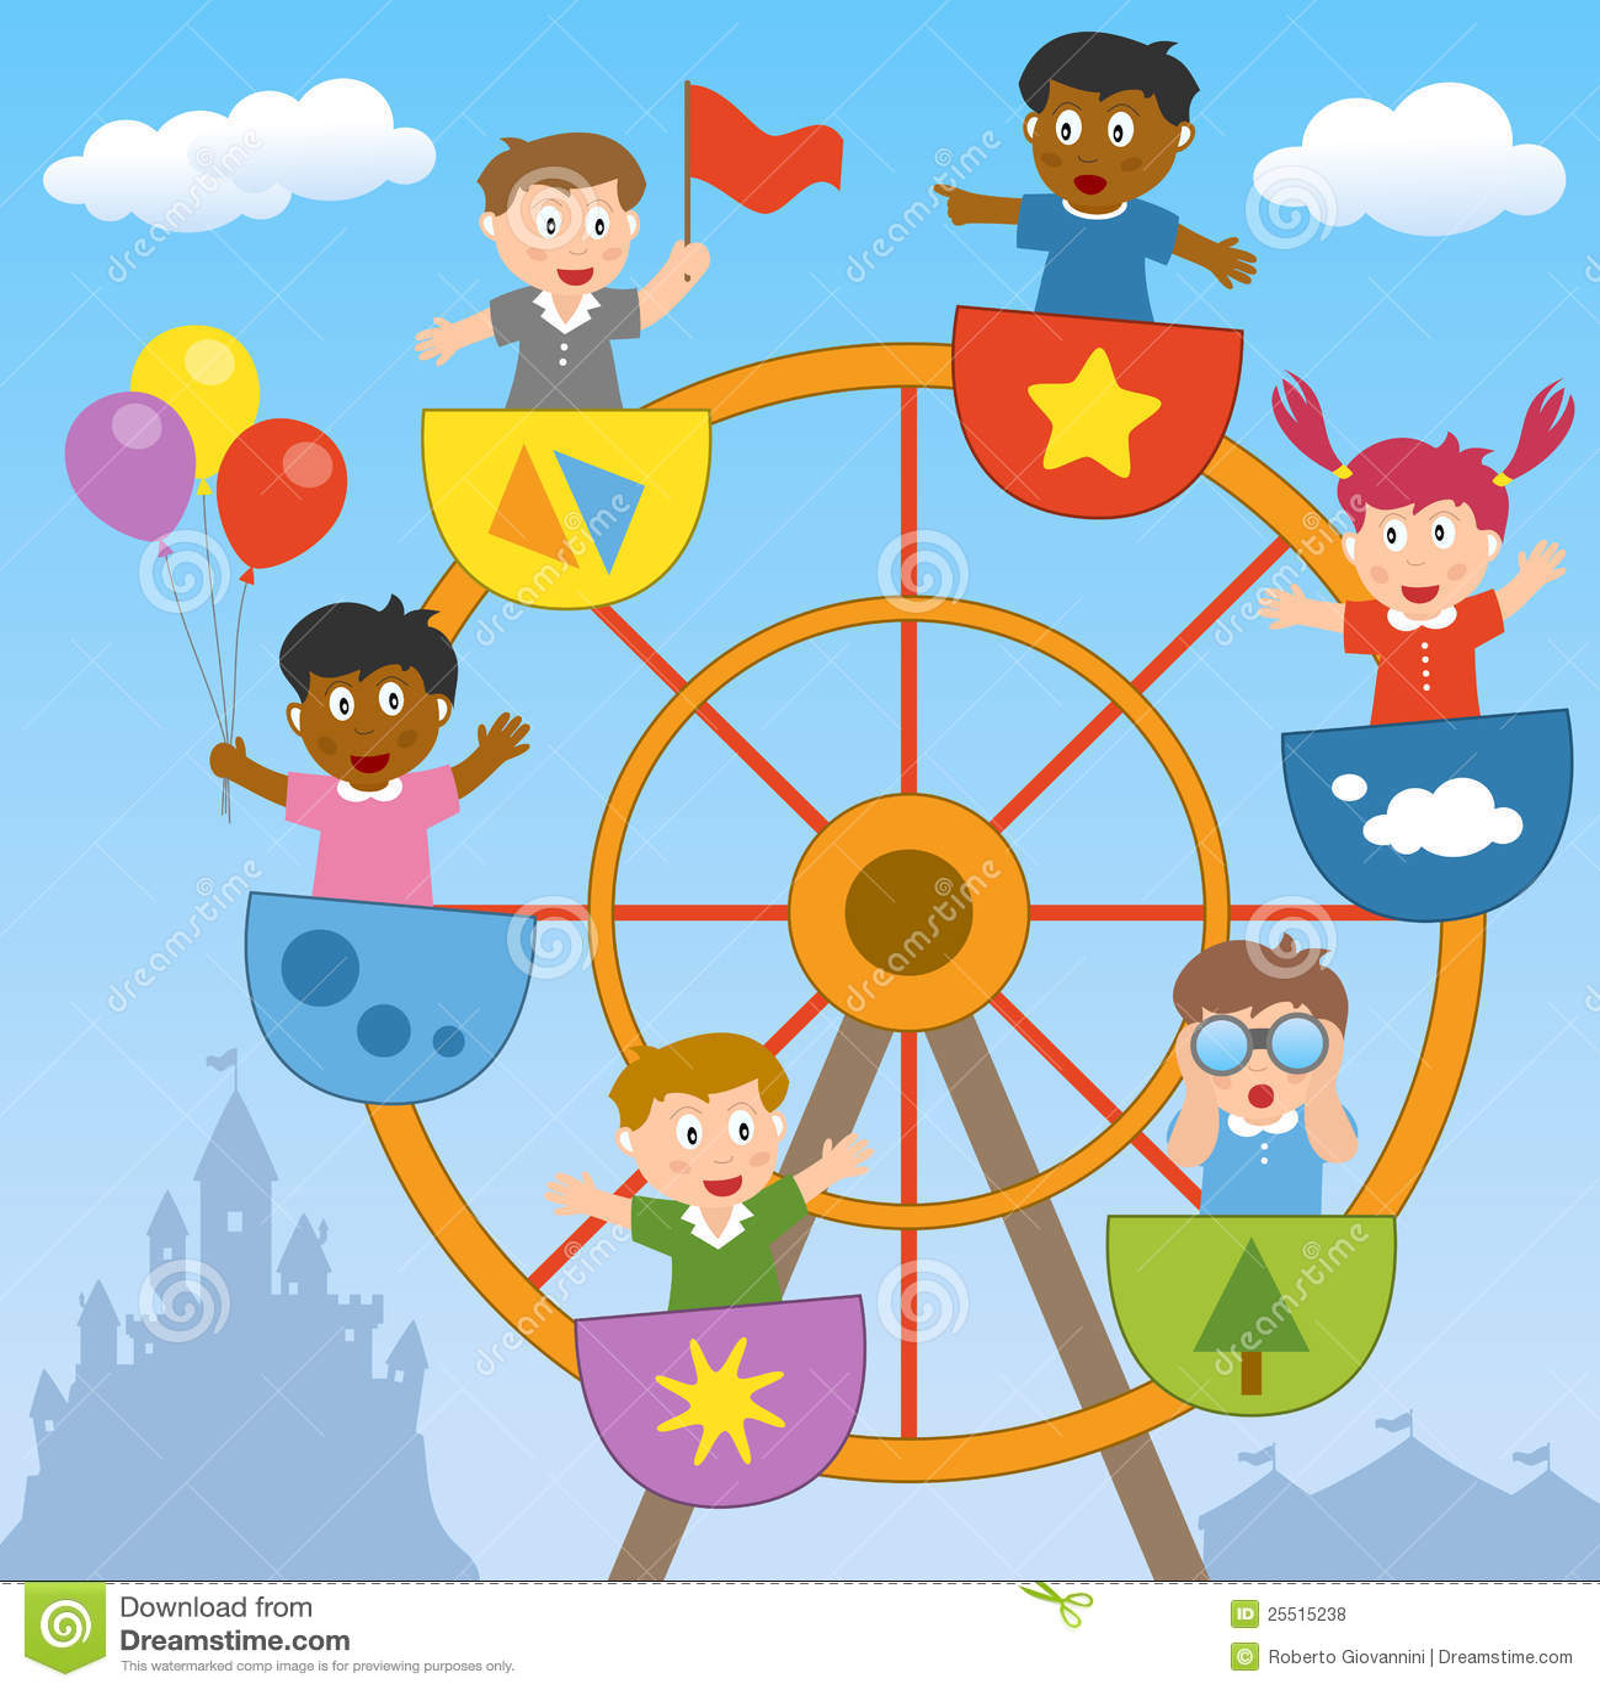 Cartoon Ferris Wheel Pictures for Kids